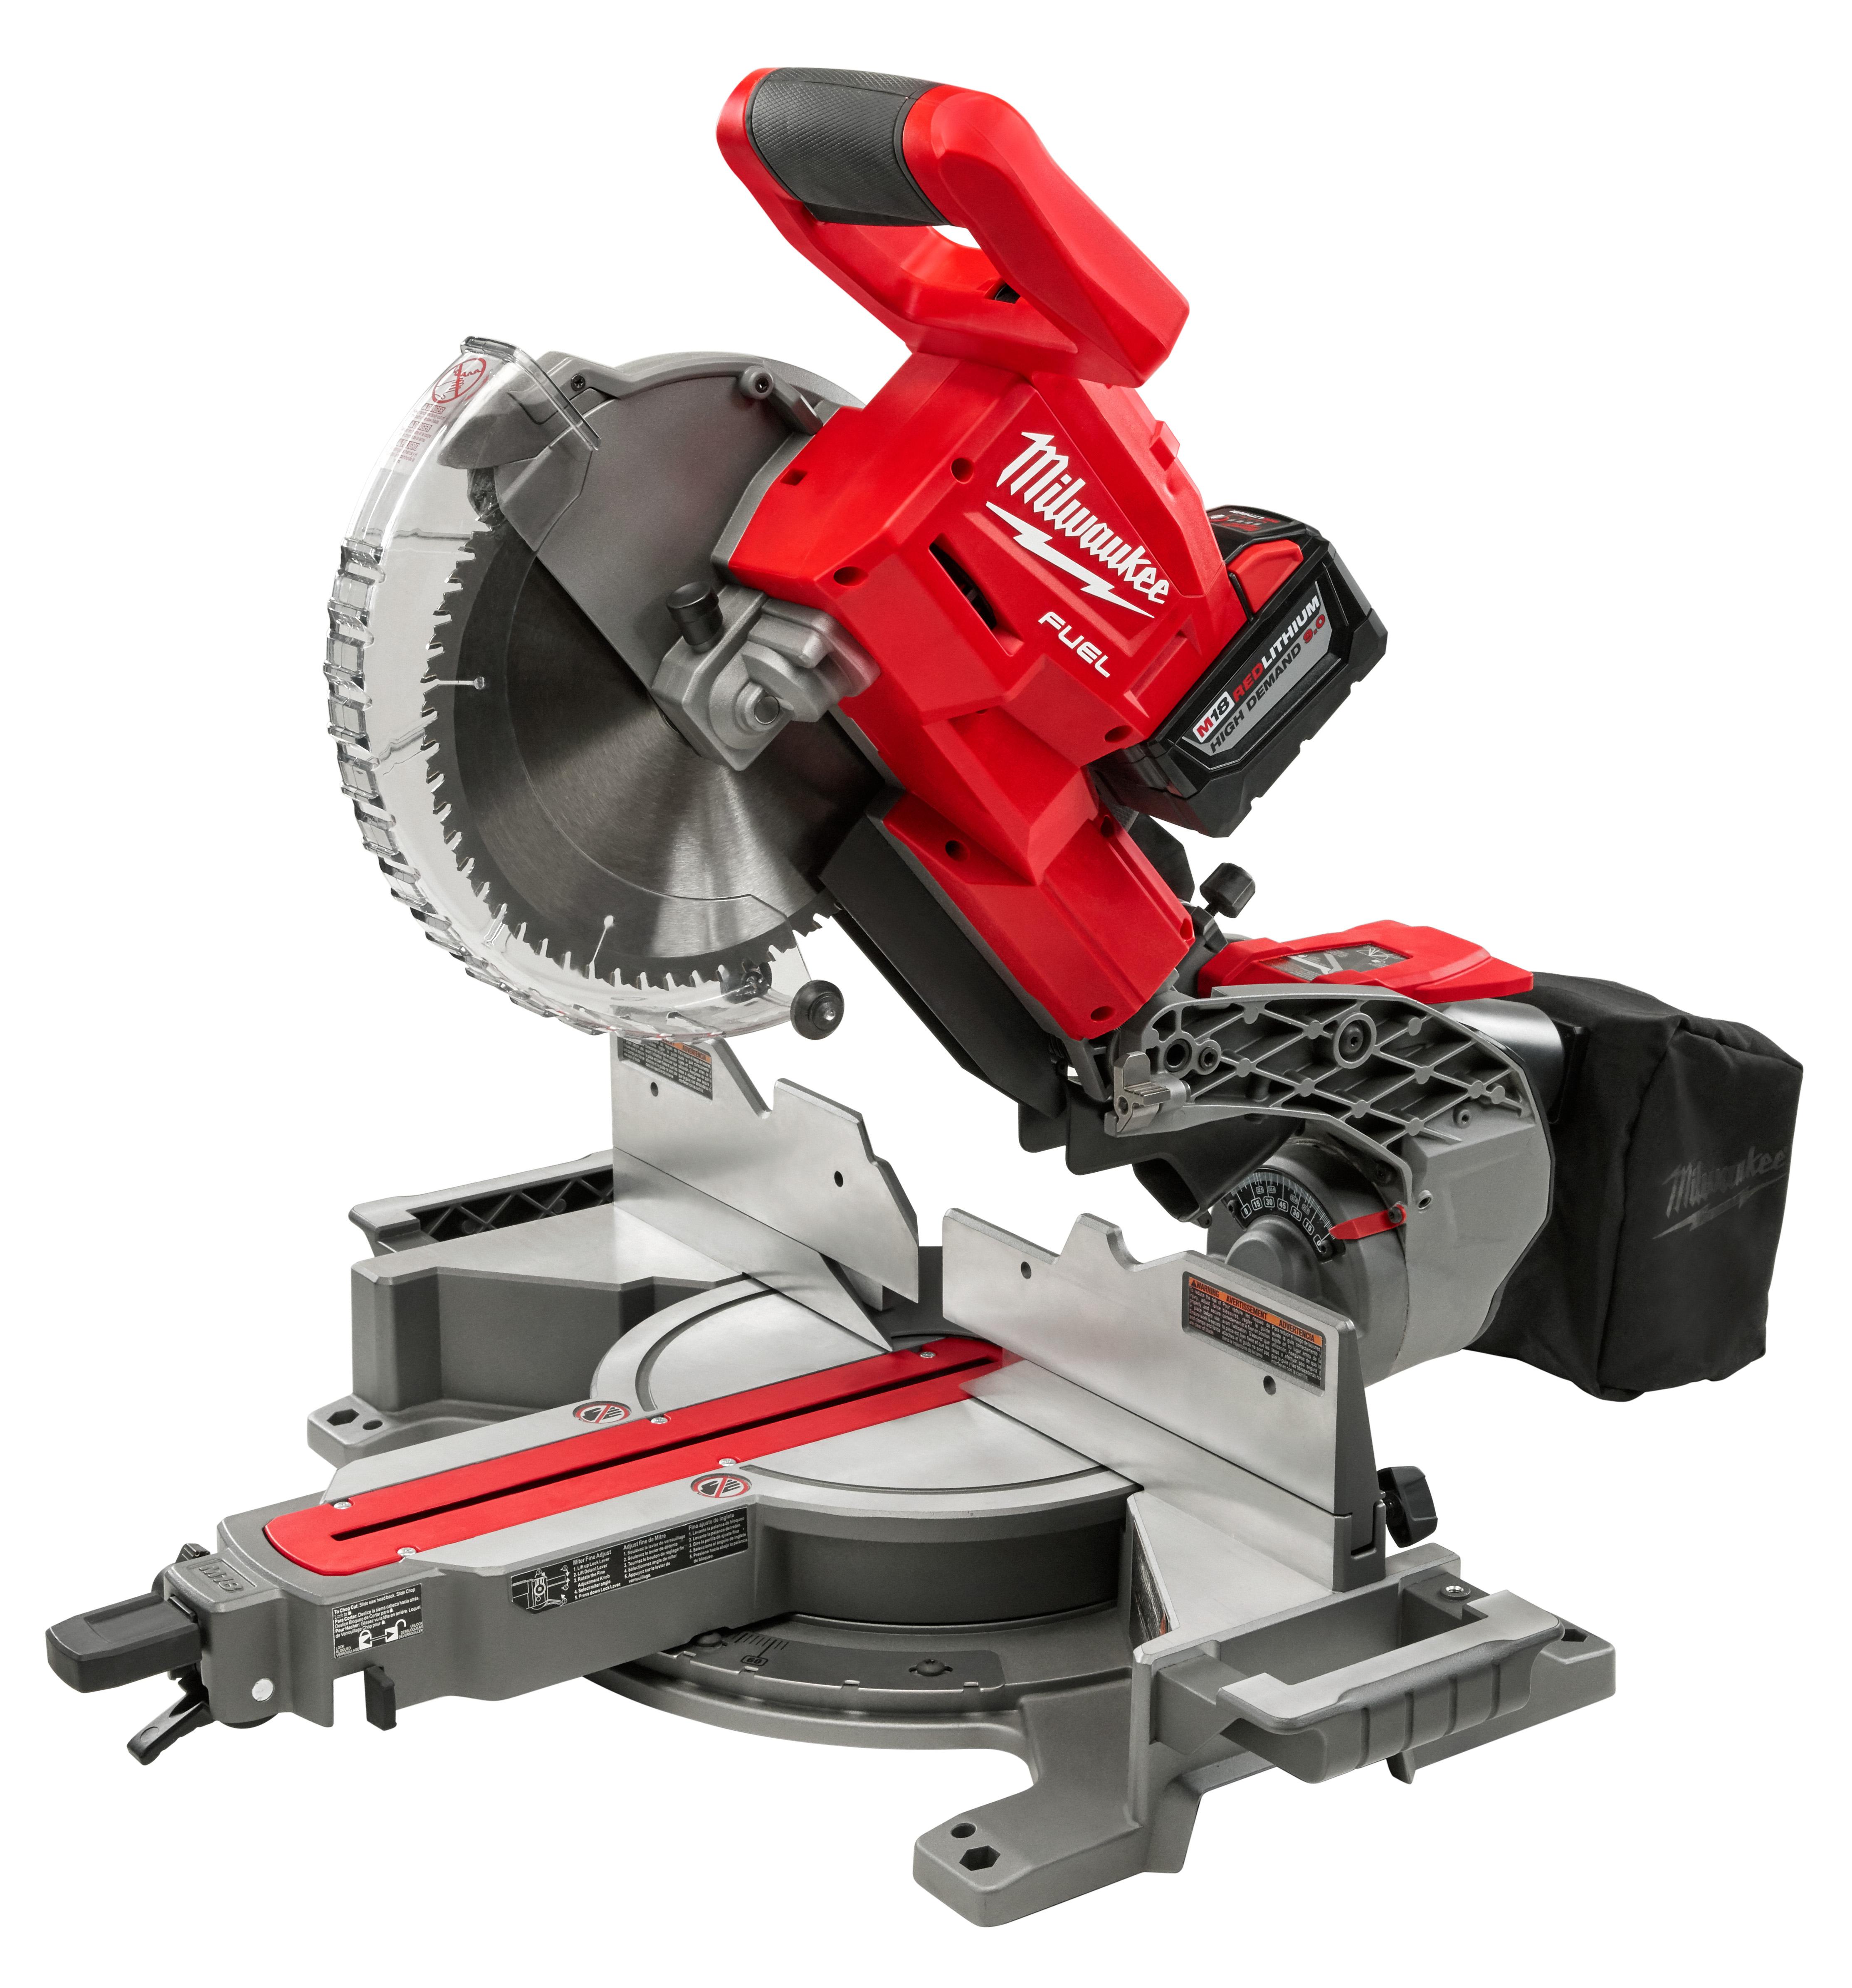 Milwaukee 2734-21HD M18 FUEL™ XC HIGH DEMAND™ Dual Bevel Sliding Compound Miter Saw Kit